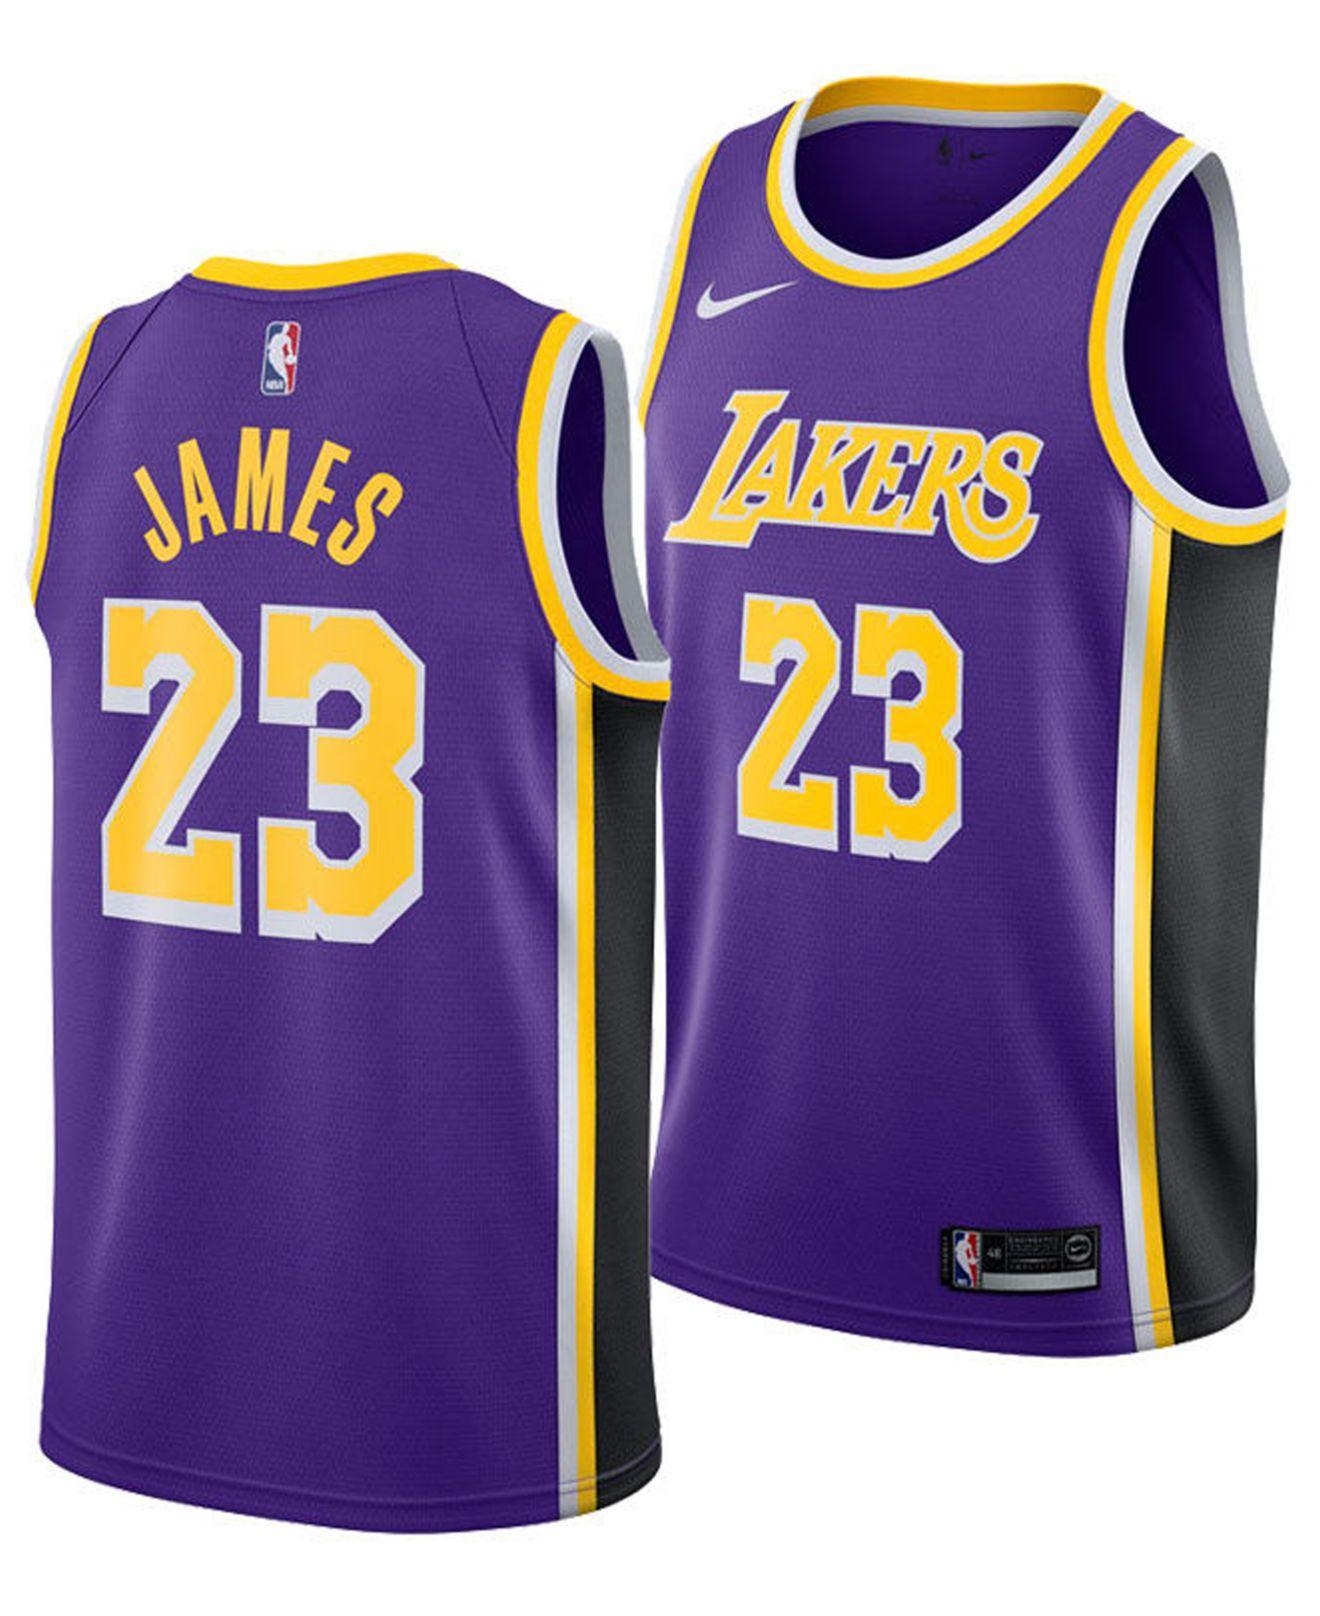 sale retailer a3ae2 5b044 Men's Purple Nba Swingman Basketball Jersey